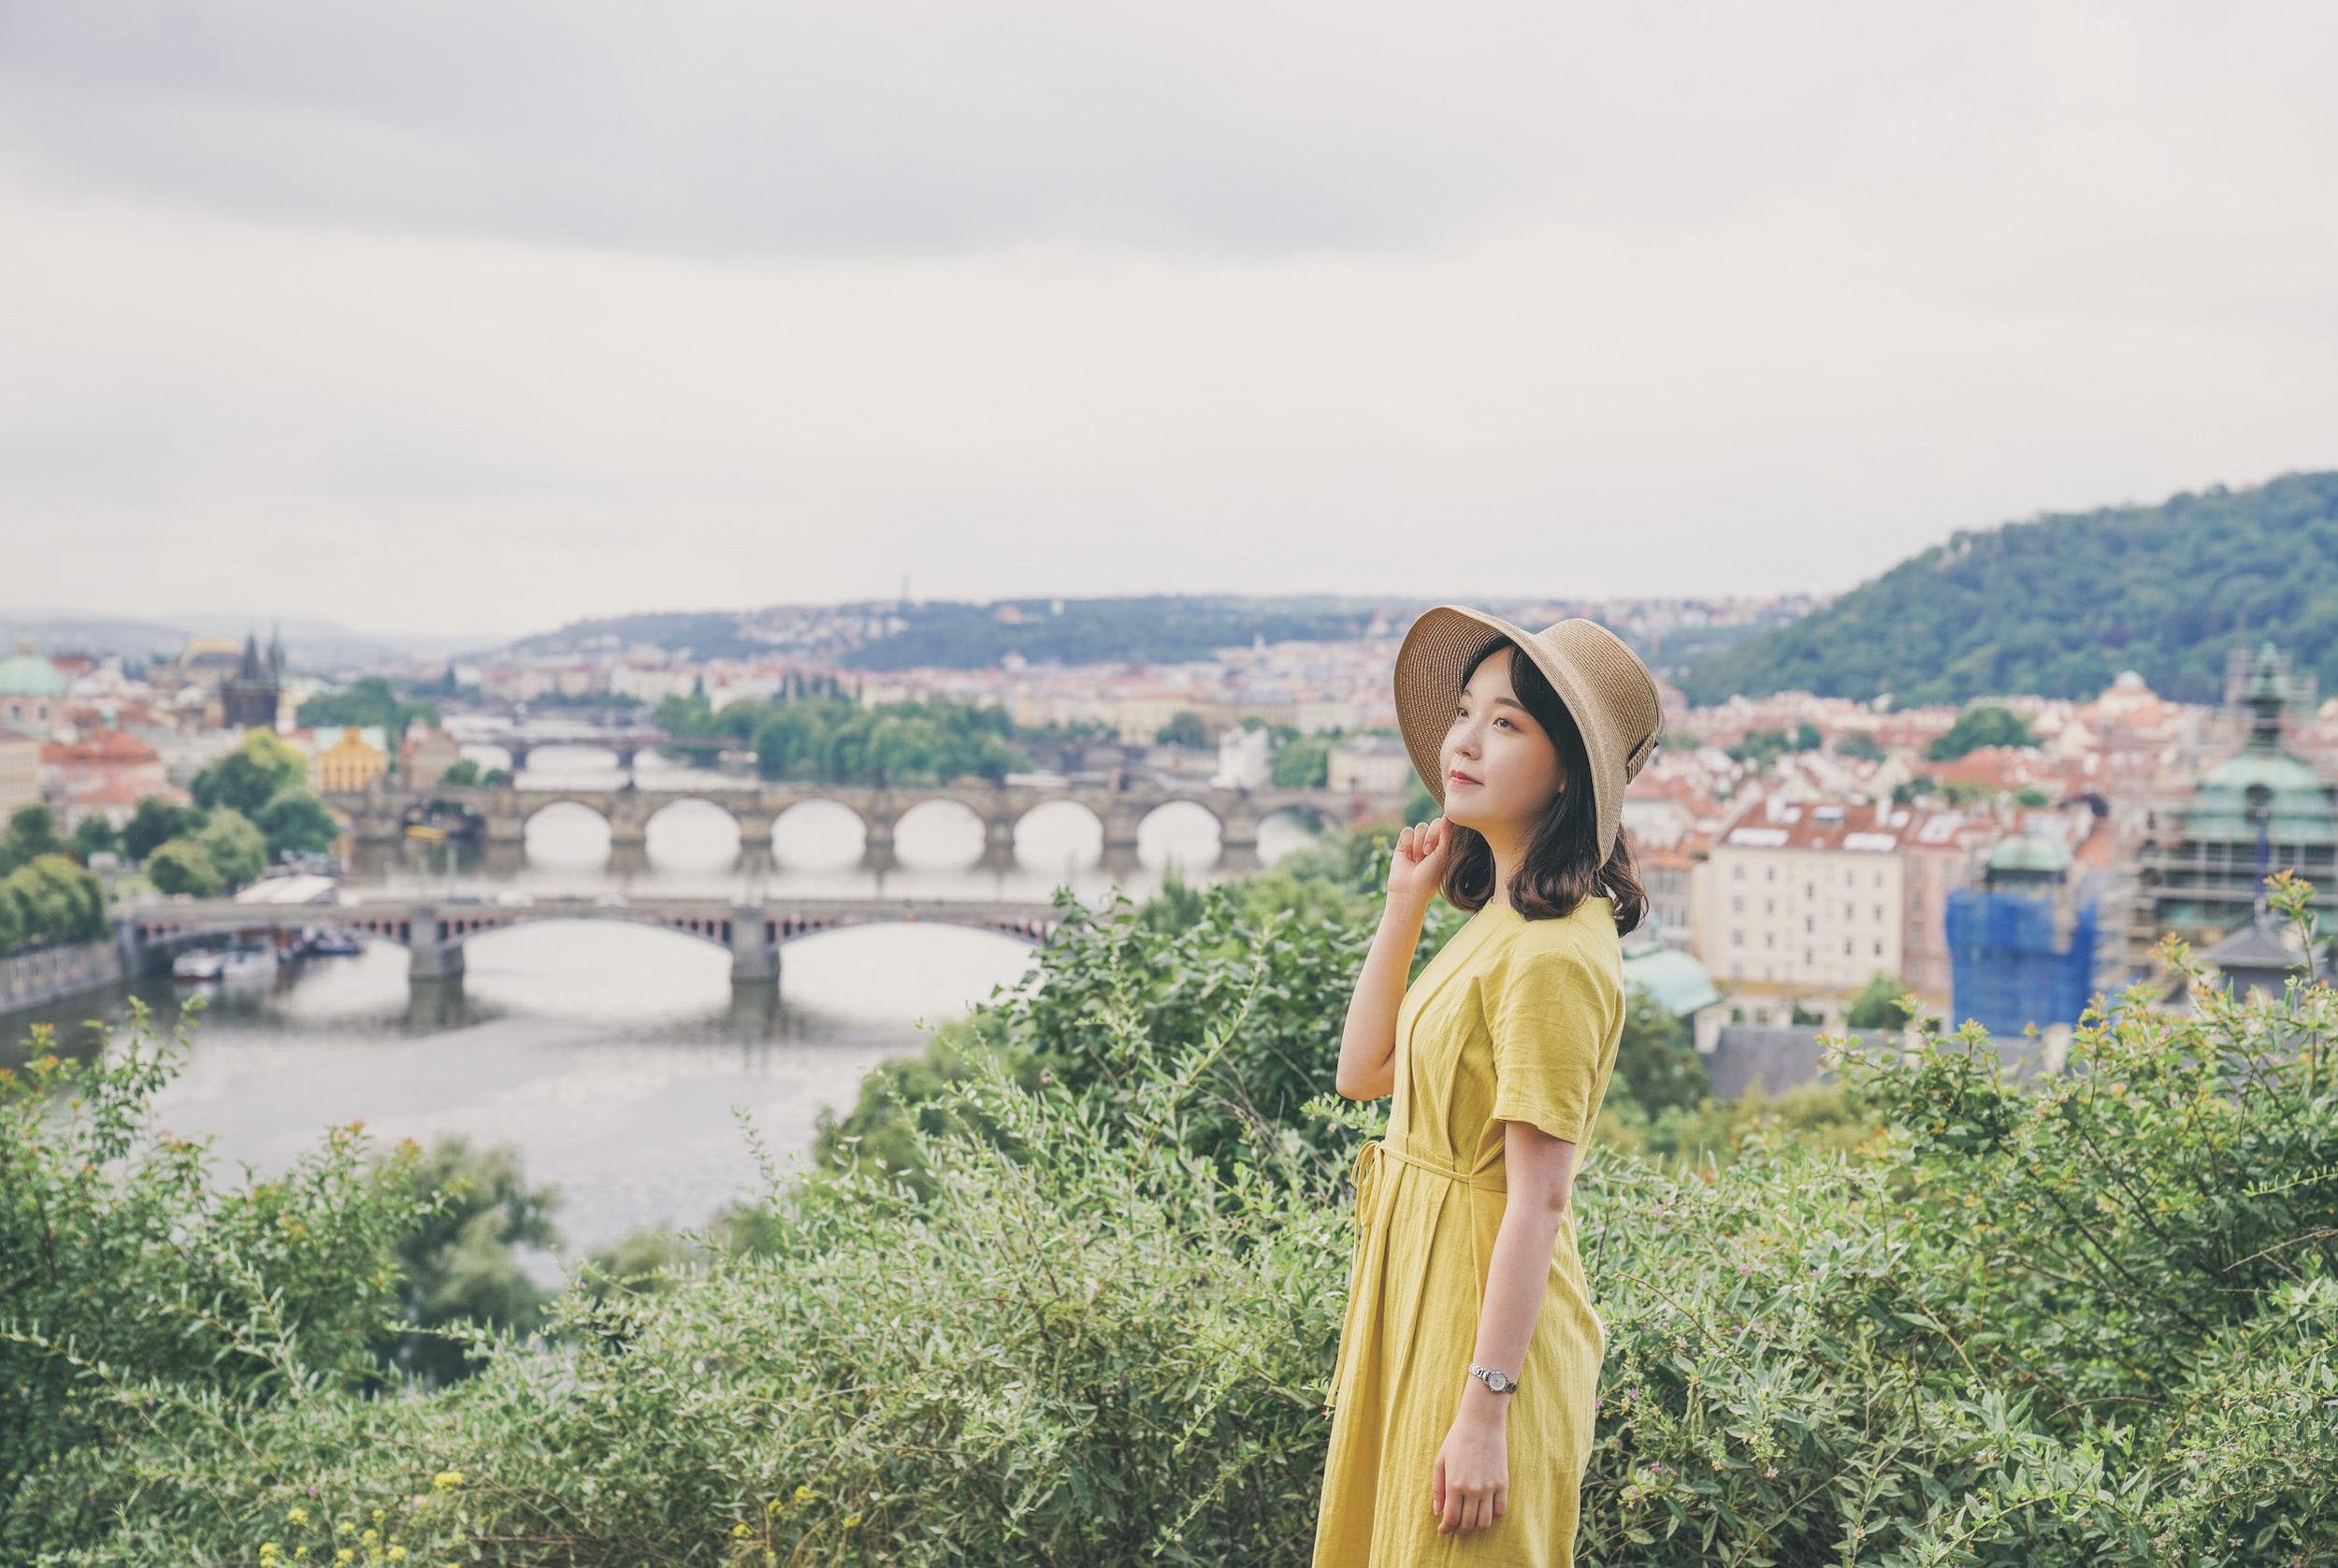 Sprazzi_Professional_Photography_Photographer_Prague_Czech-Republic_Irene_Original_15.jpg